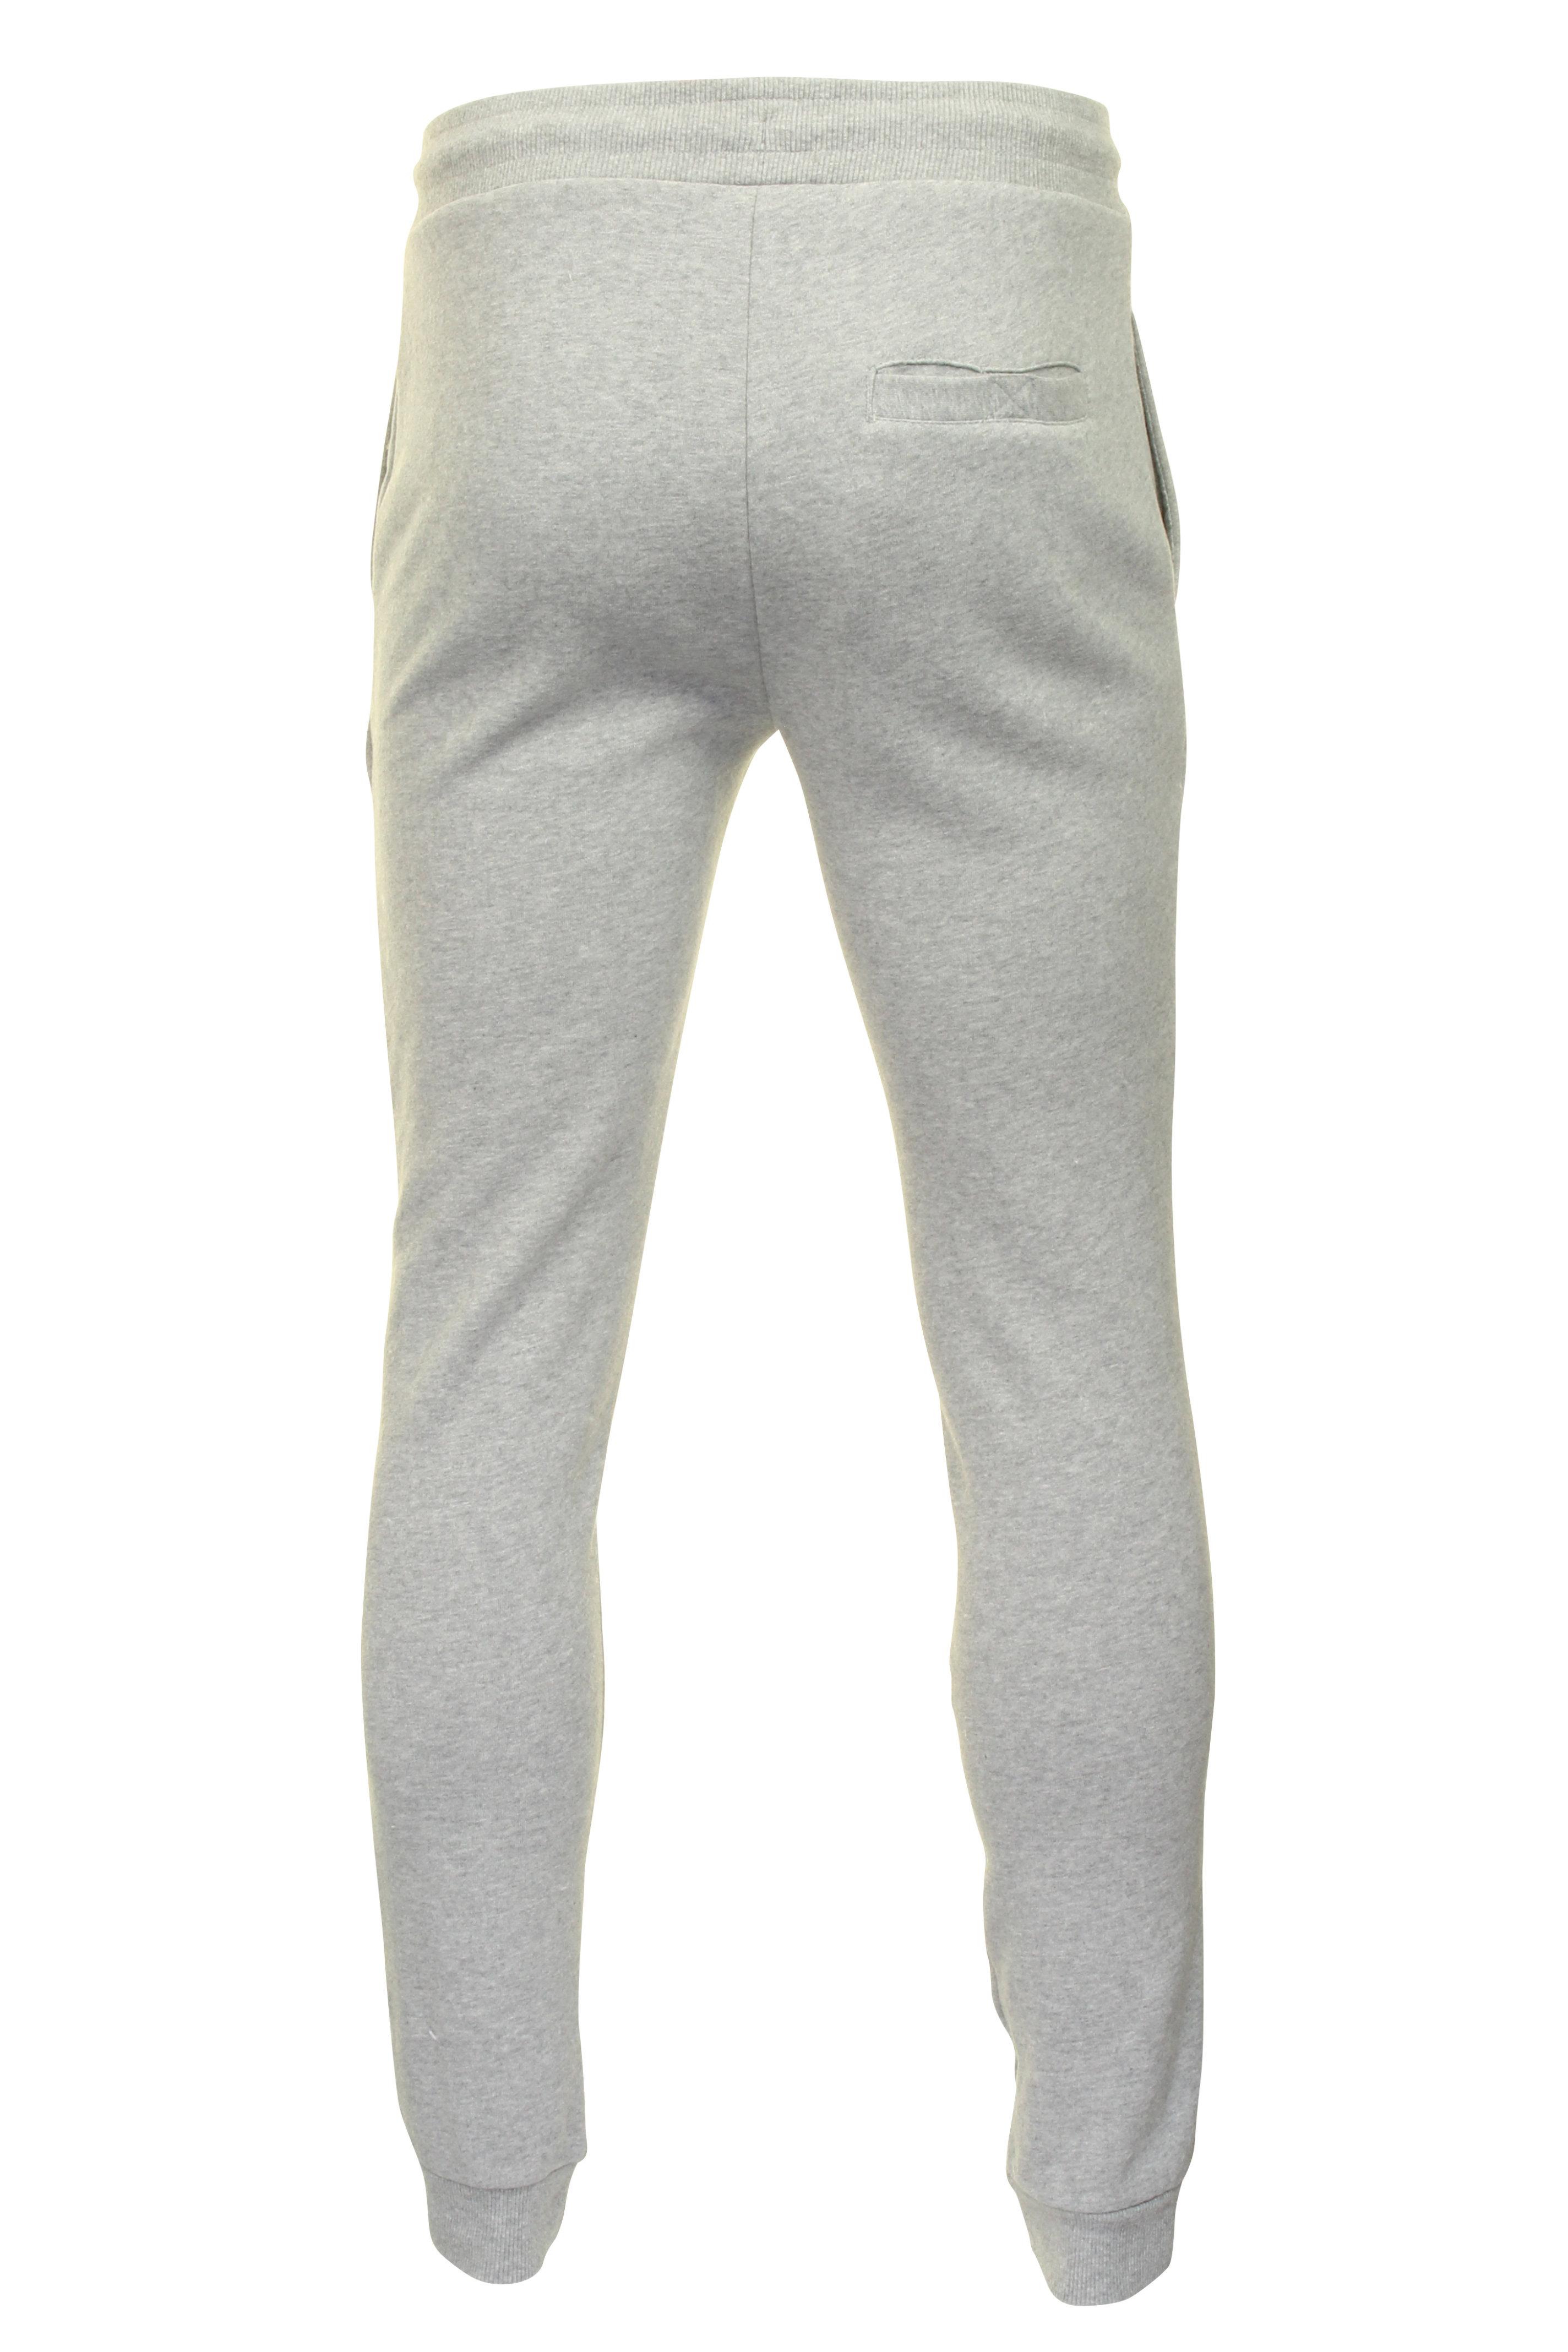 Ellesse-Da-Uomo-Pantaloni-Sportivi-Jog-Pantaloni-con-logo-034-Ovest-034 miniatura 11